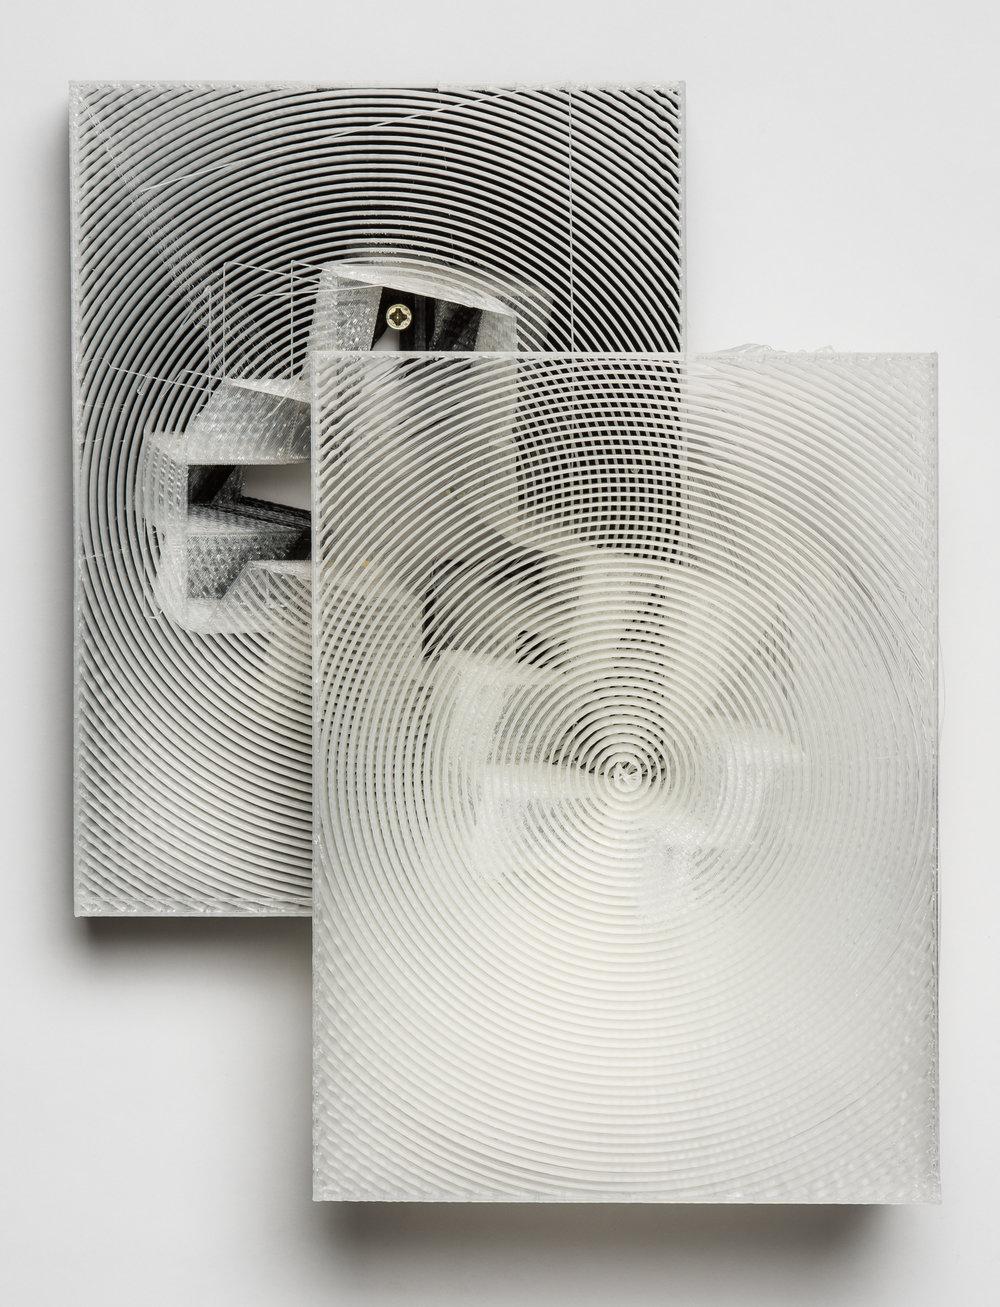 Structure No.22_PLA-3D printed_10x12x5 inches_Eunjin.KIM.jpg